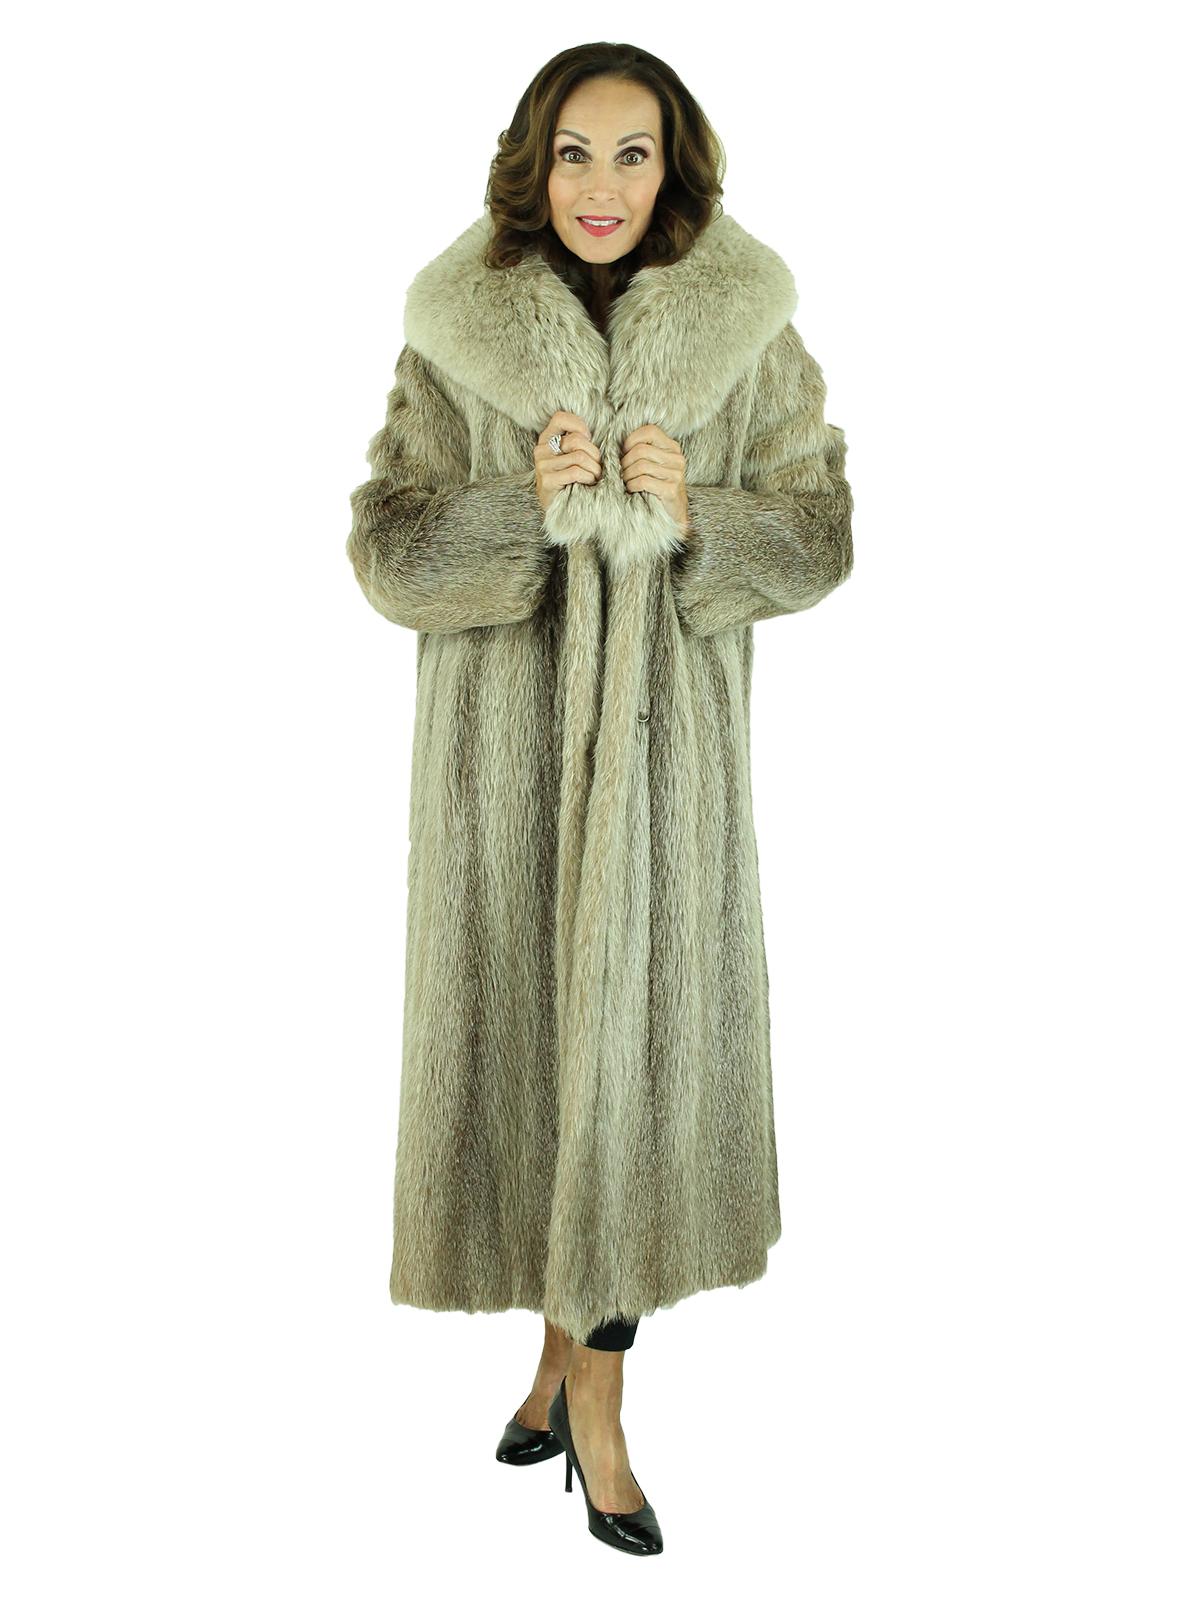 Woman's Vintage Nutria Fur Coat with Blush Fox Collar